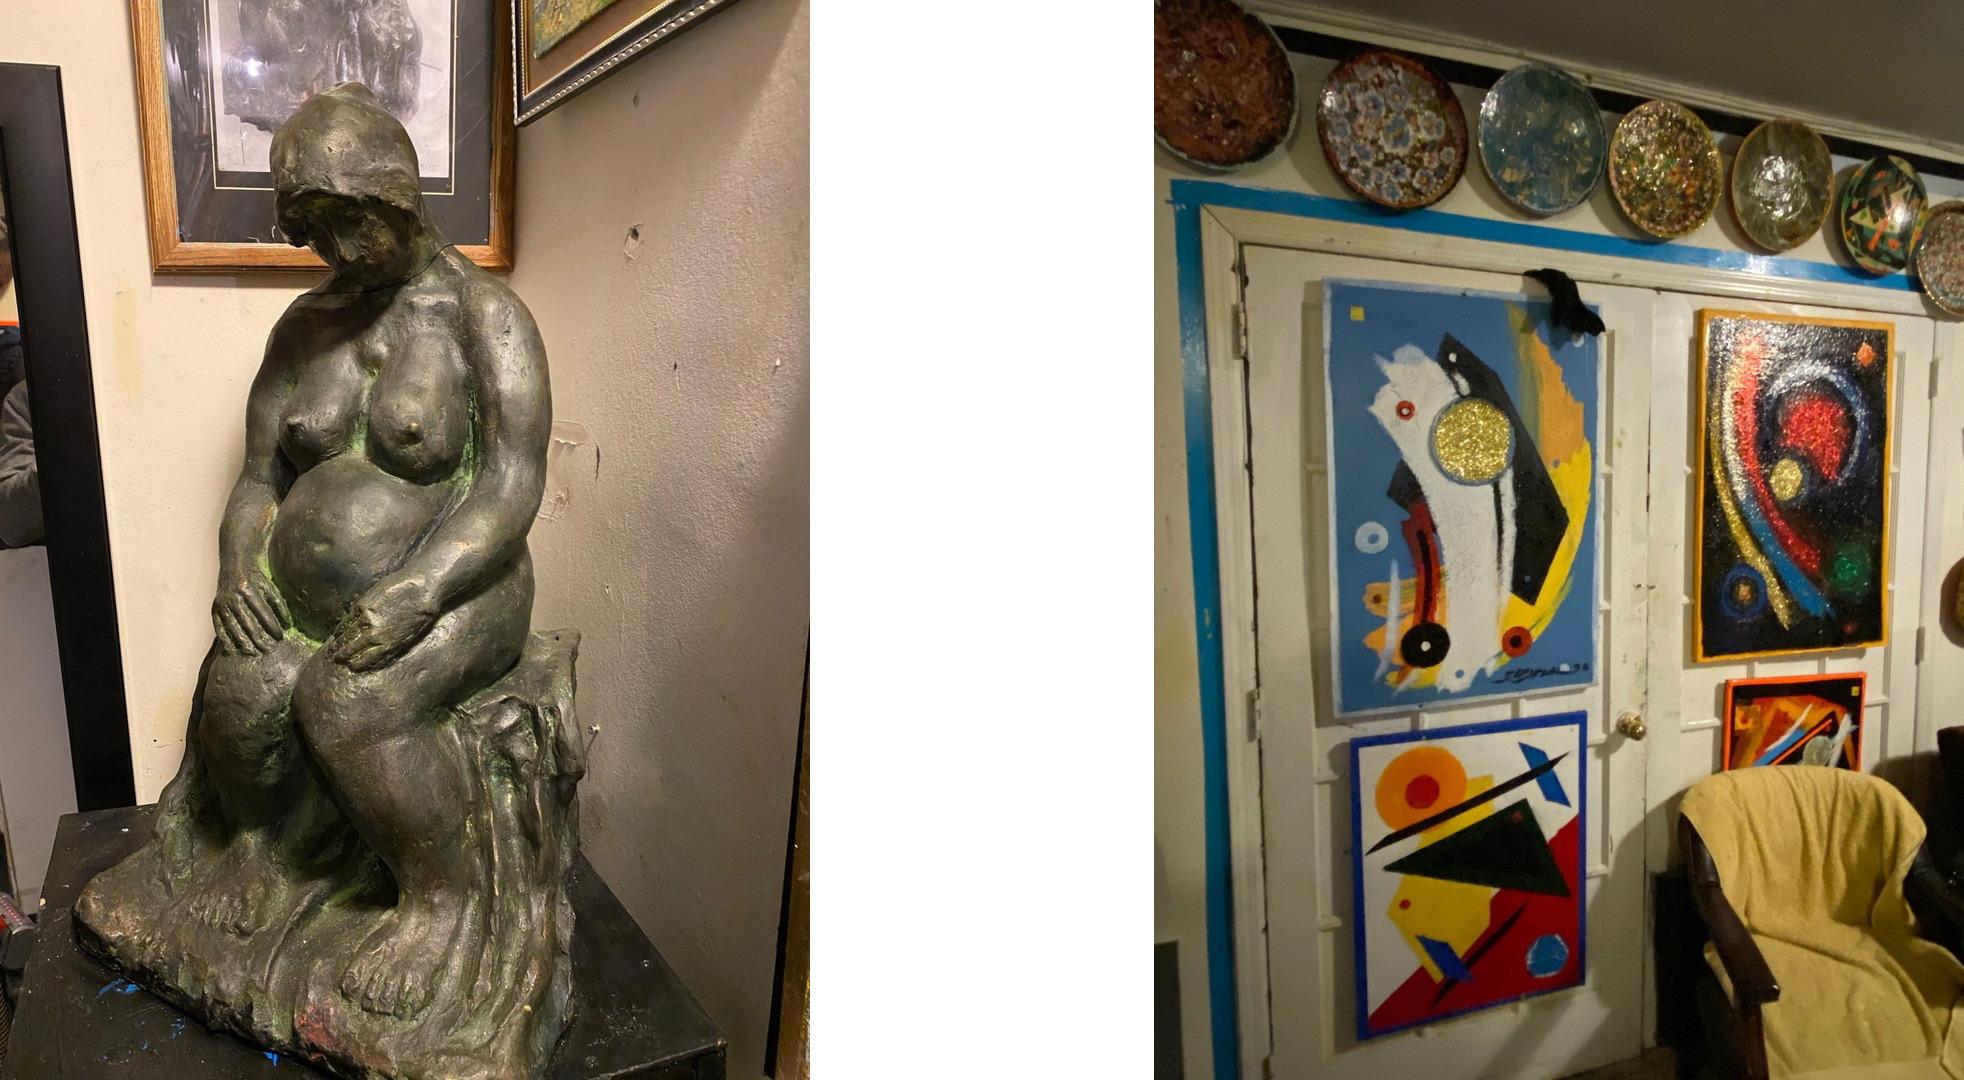 Visiting the Amazing Art Studio of Mikhail Zvyagin